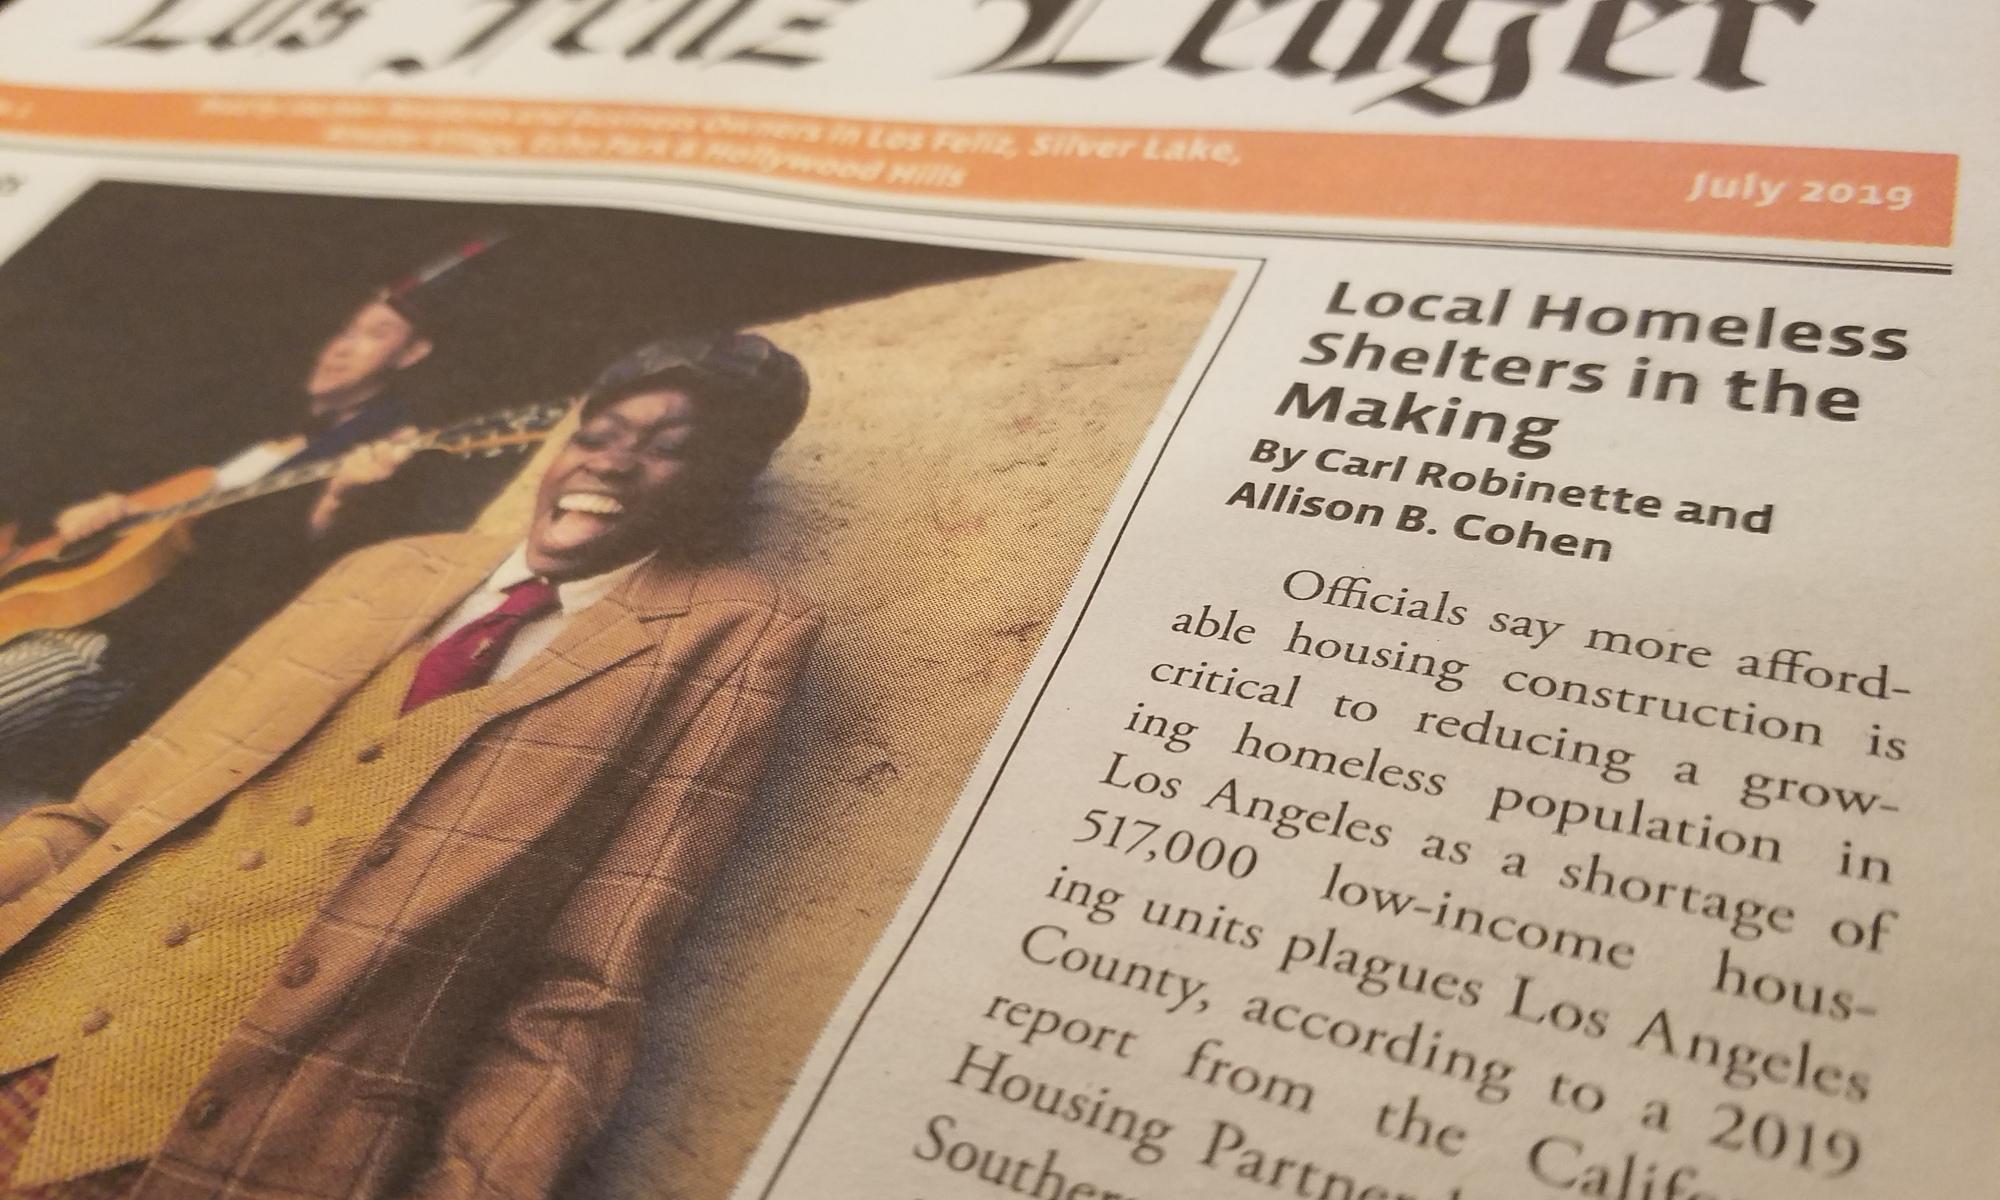 homeless housing news los feliz ledger carl robinette silver lake los feliz atwater village hollywood